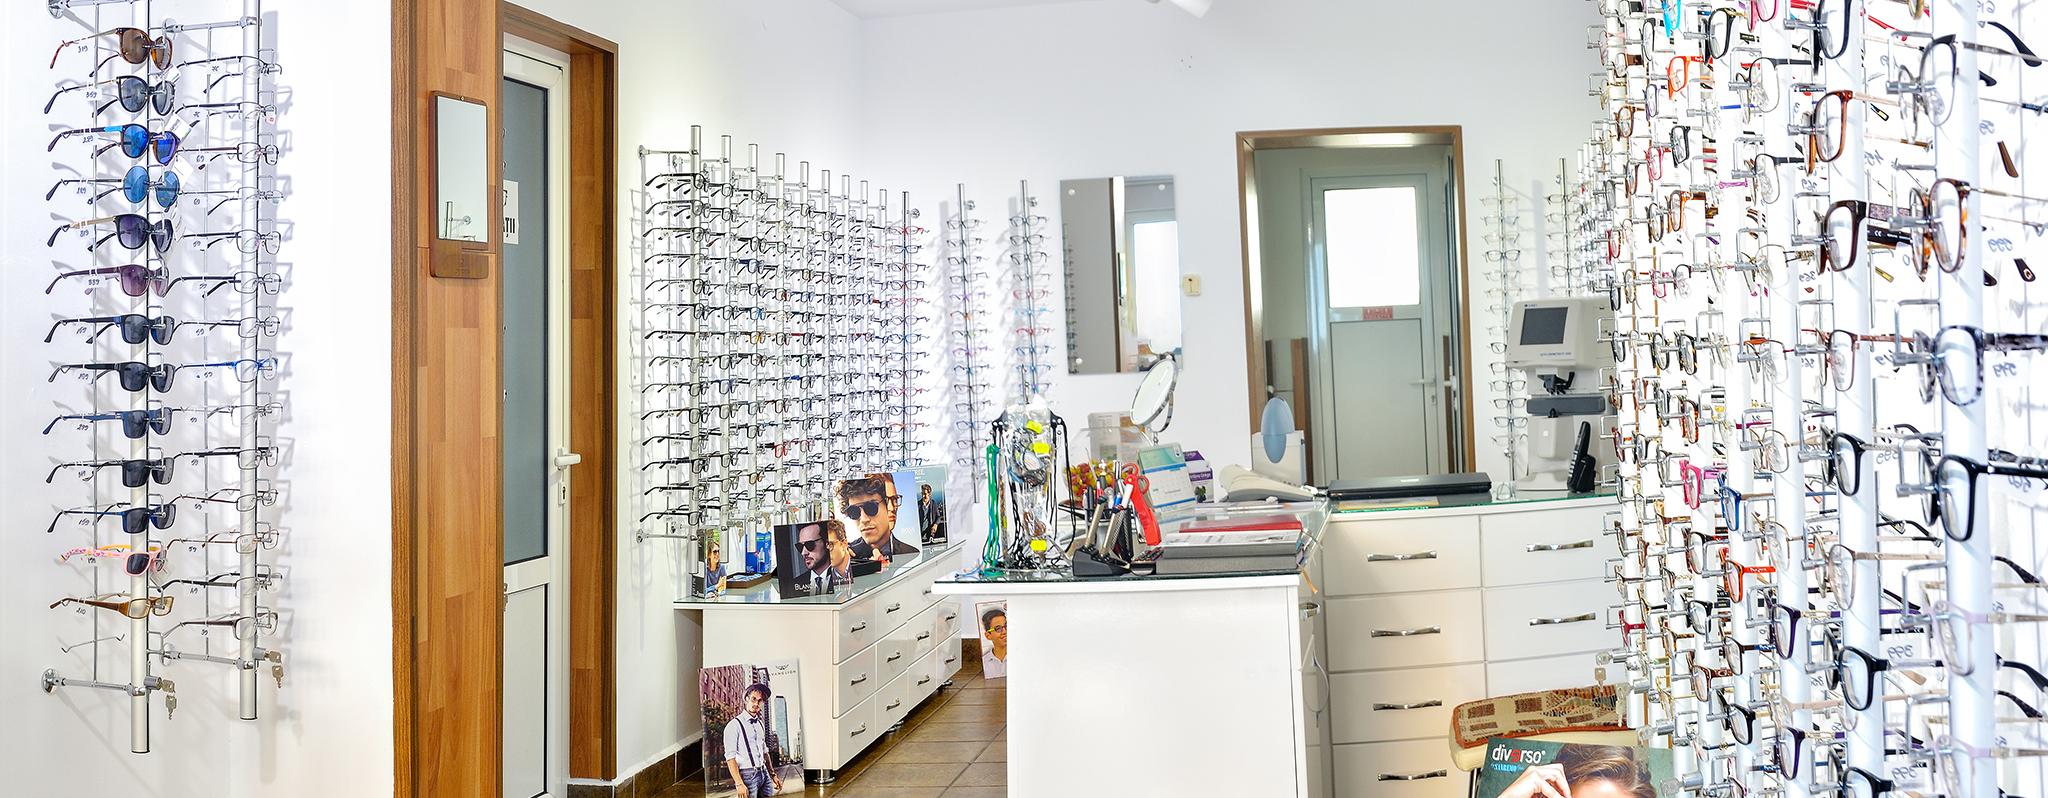 oftalmologie-optica-medicala-alba-8